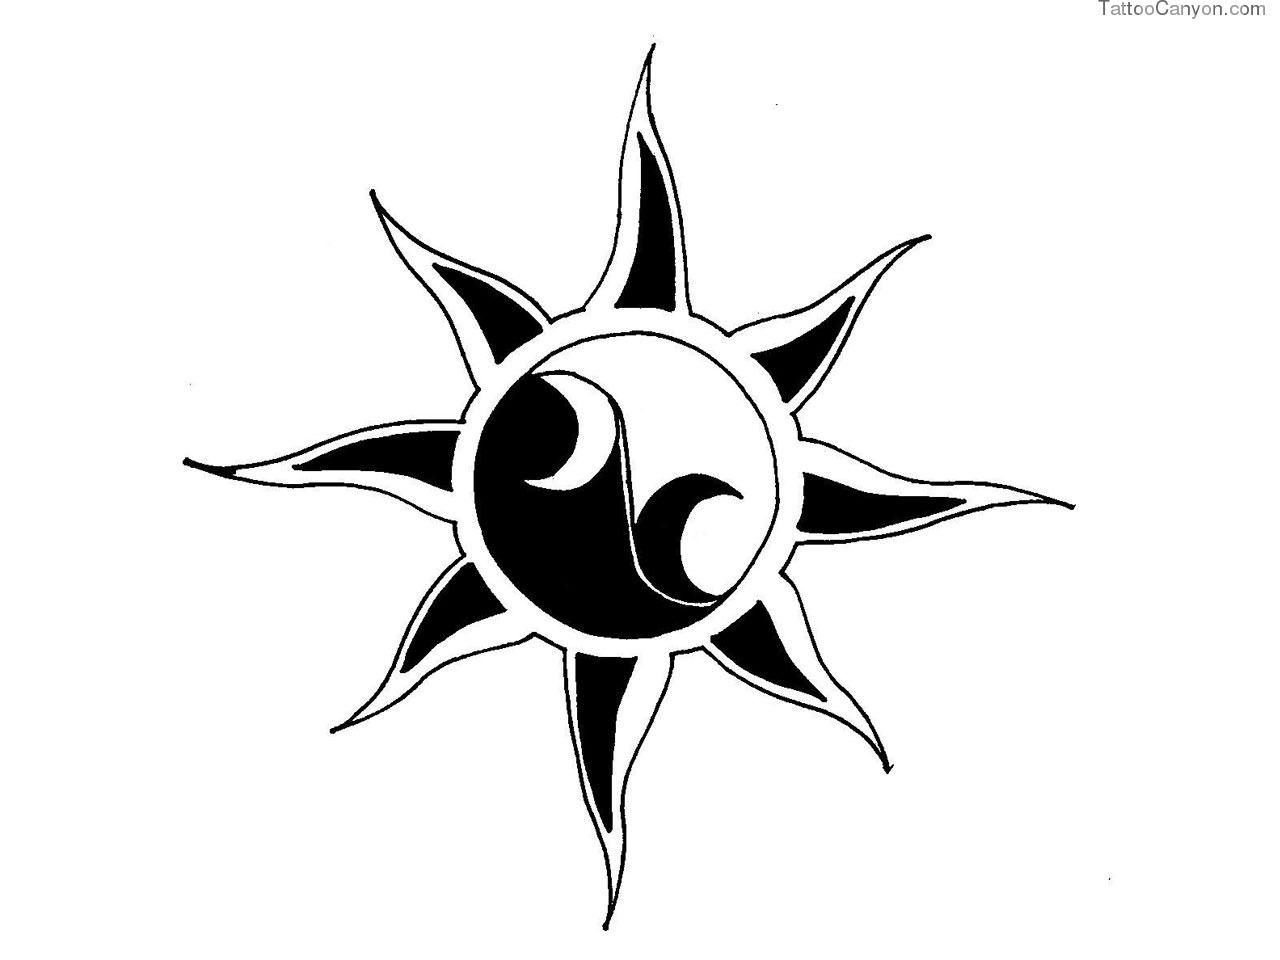 Basic Art Designs : Simple tattoos designs clipart best